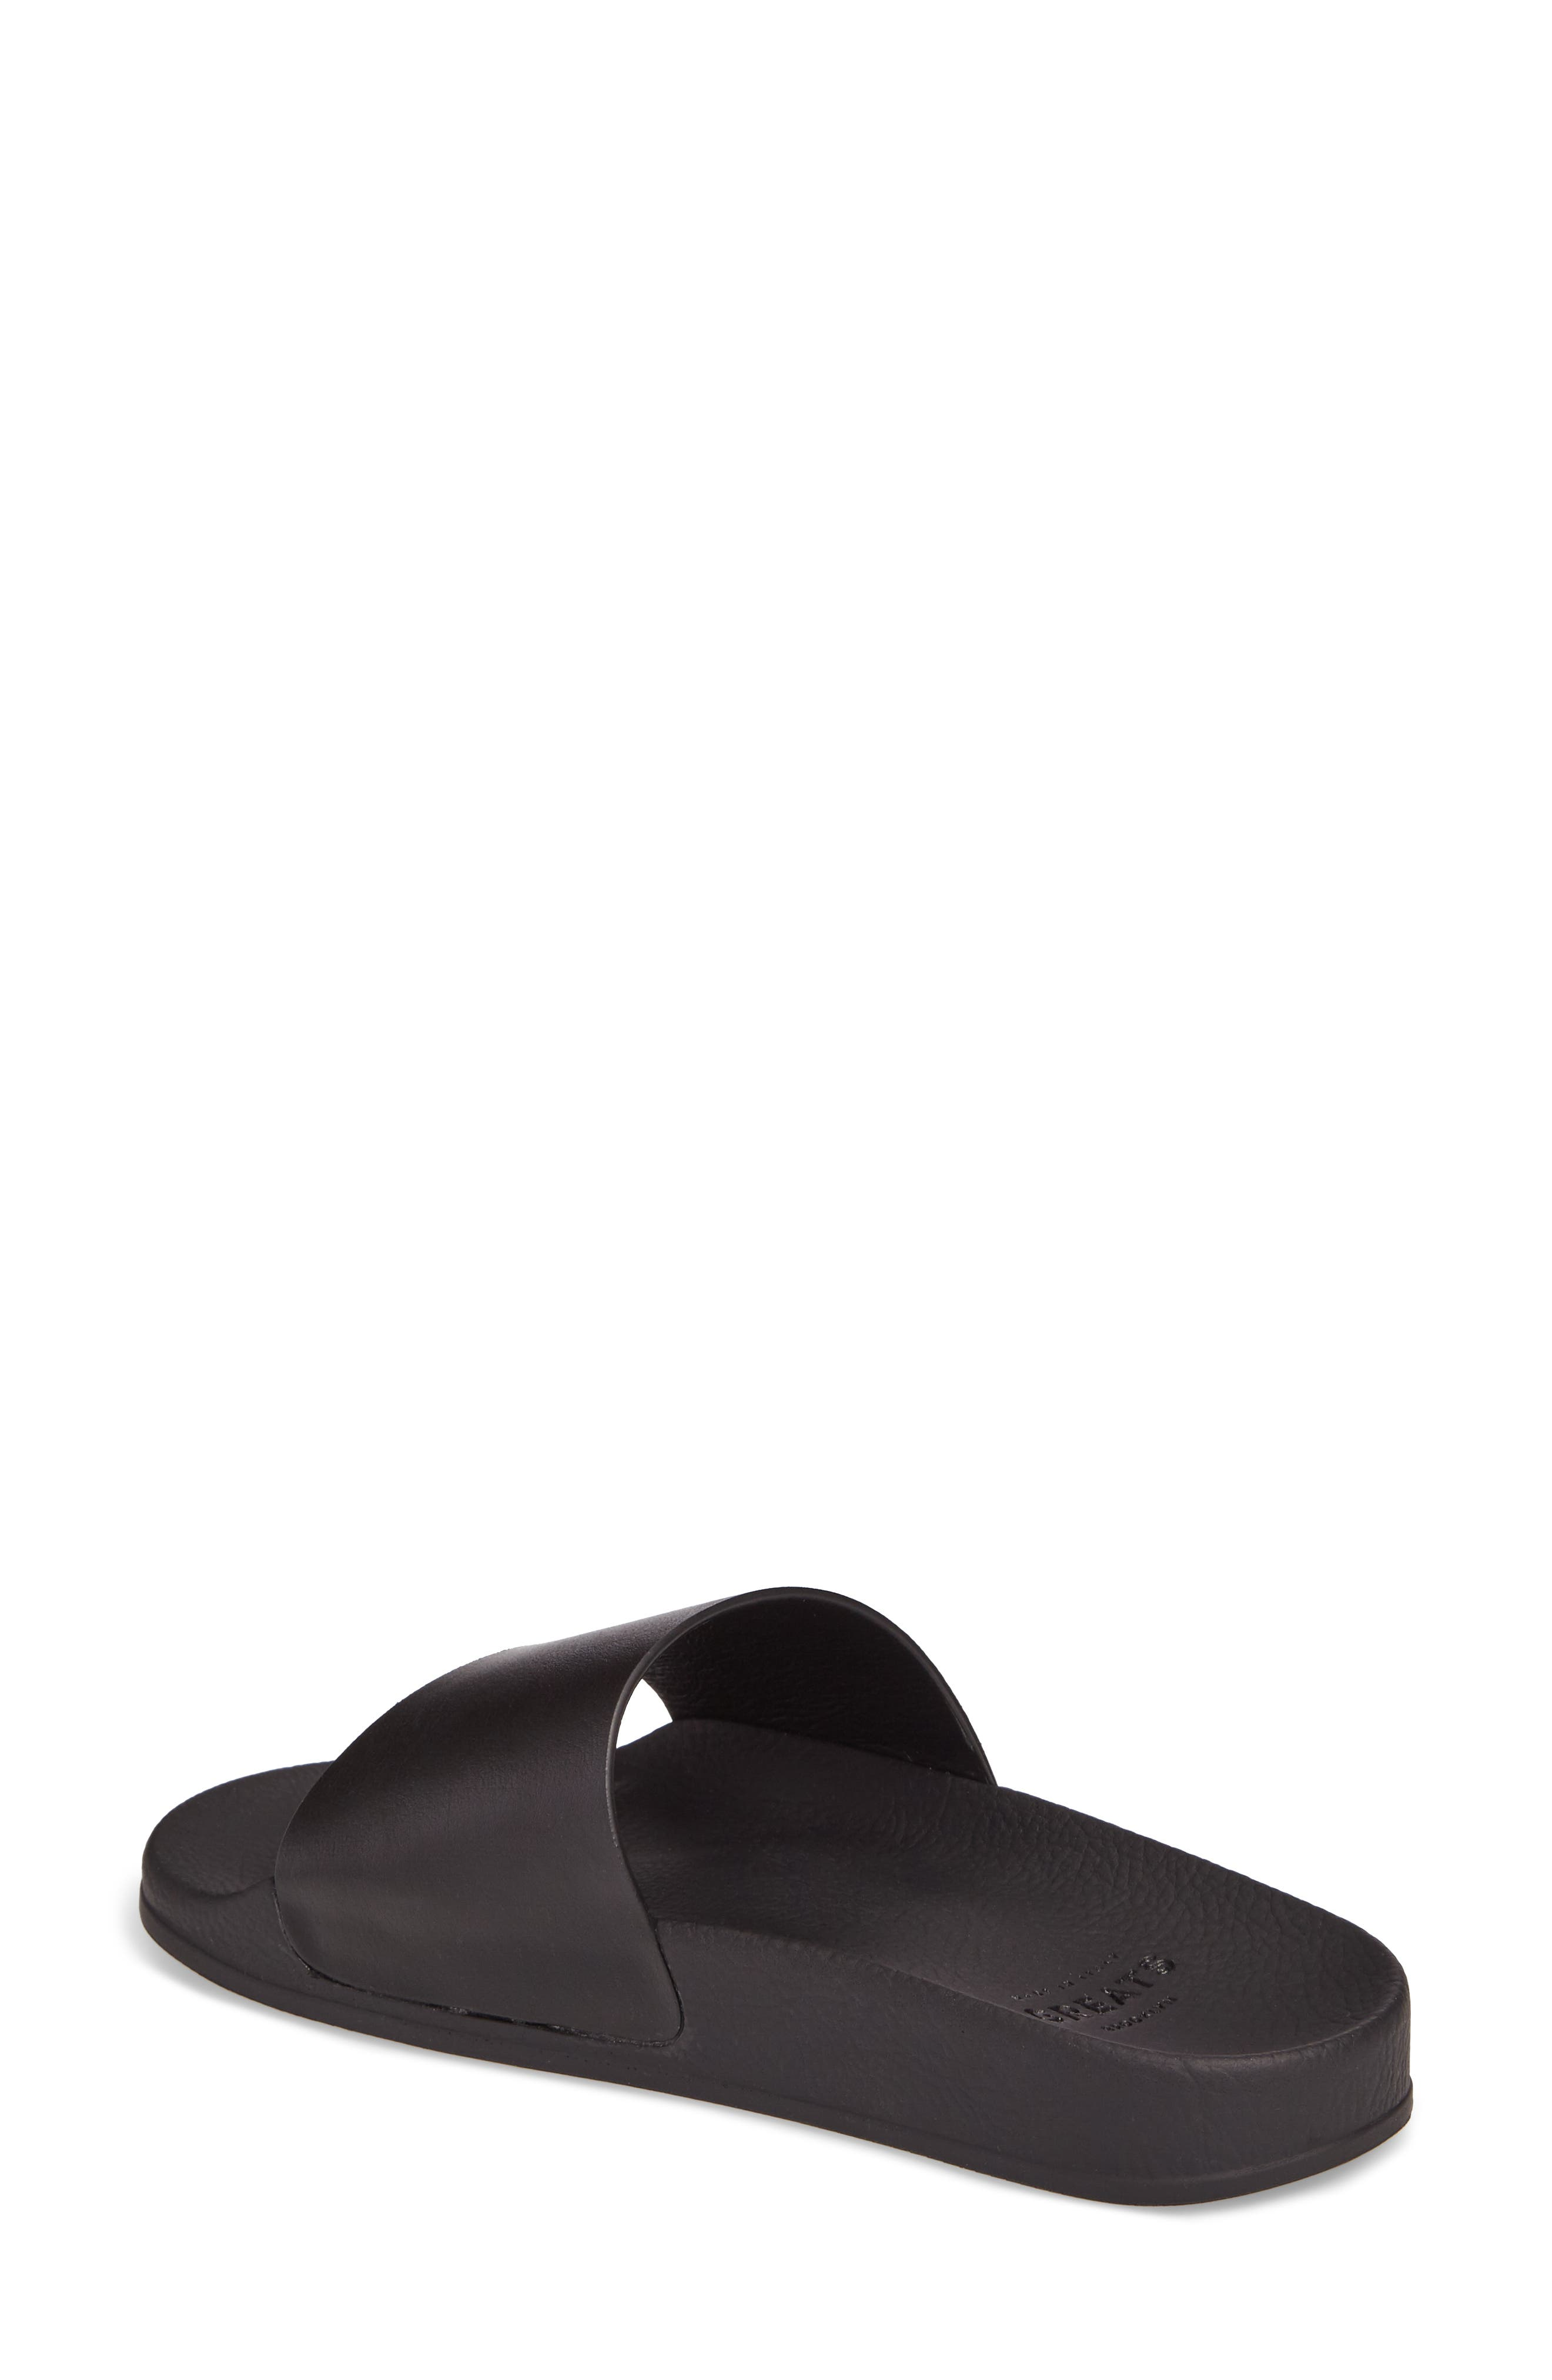 Amalfi Slide Sandal,                             Alternate thumbnail 2, color,                             001